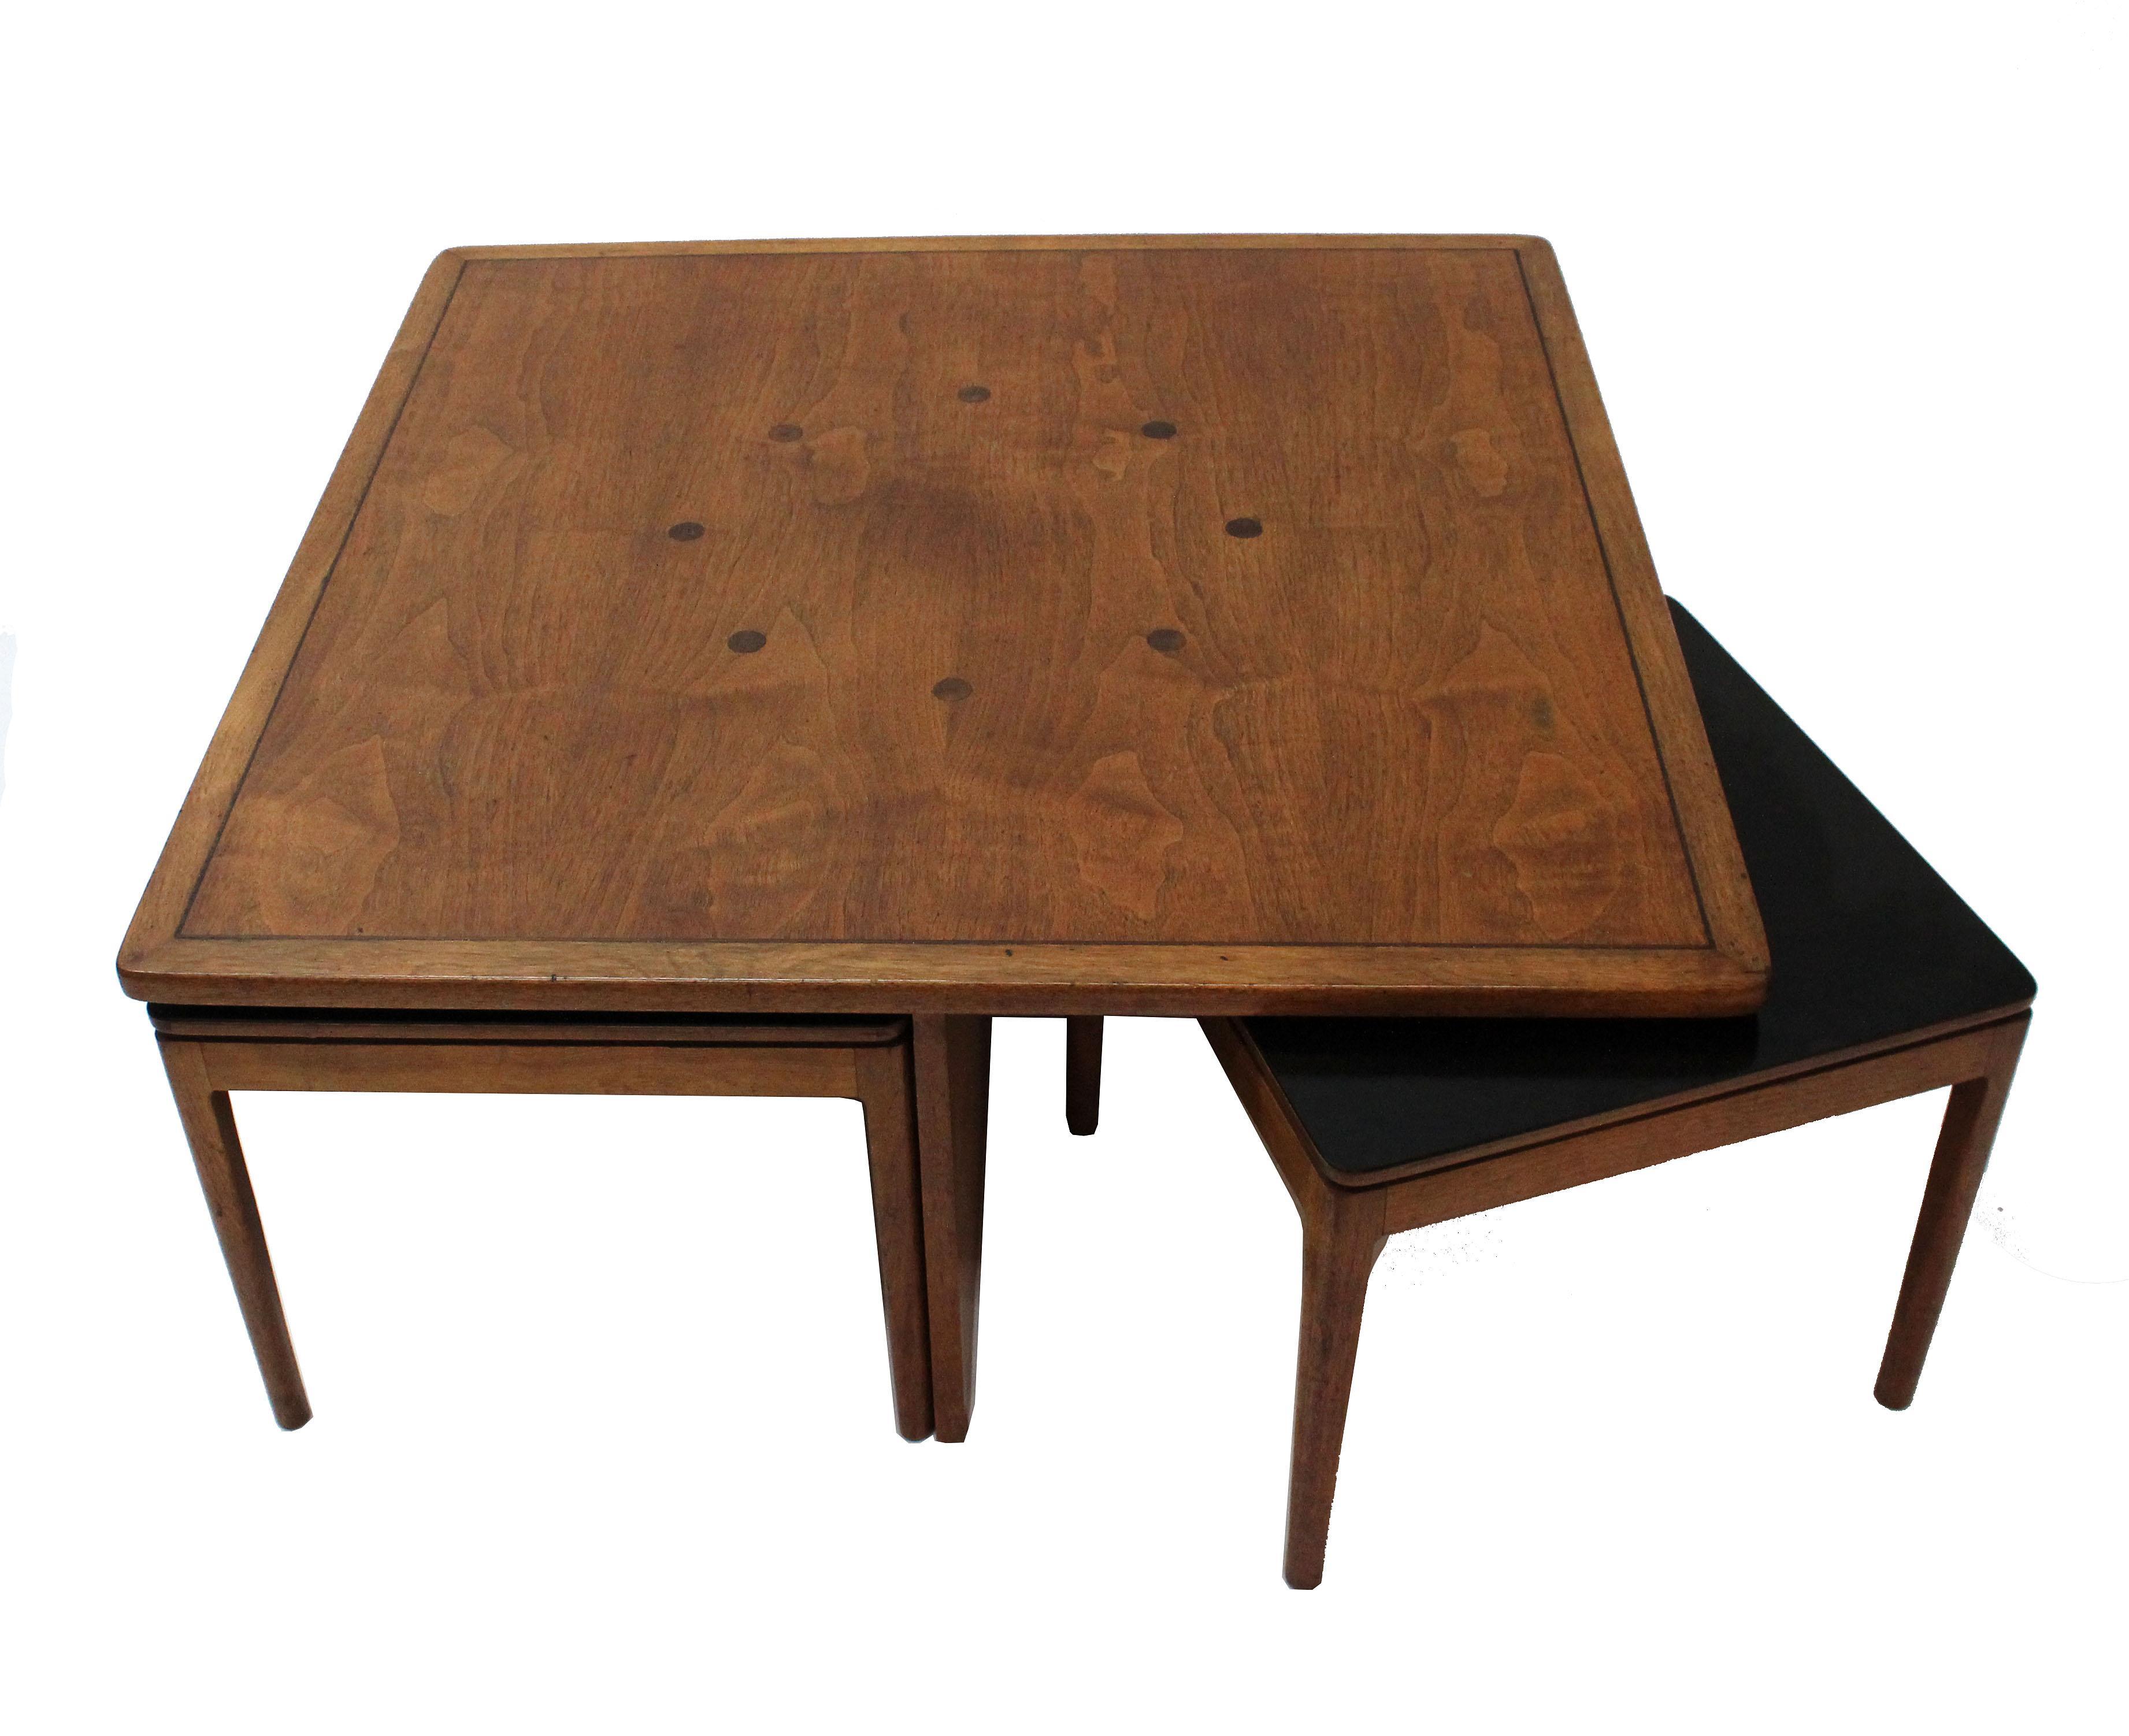 Kipp Stewart Drexel Declaration Coffee Table Cocktail Table 4 Ottomans Chairish